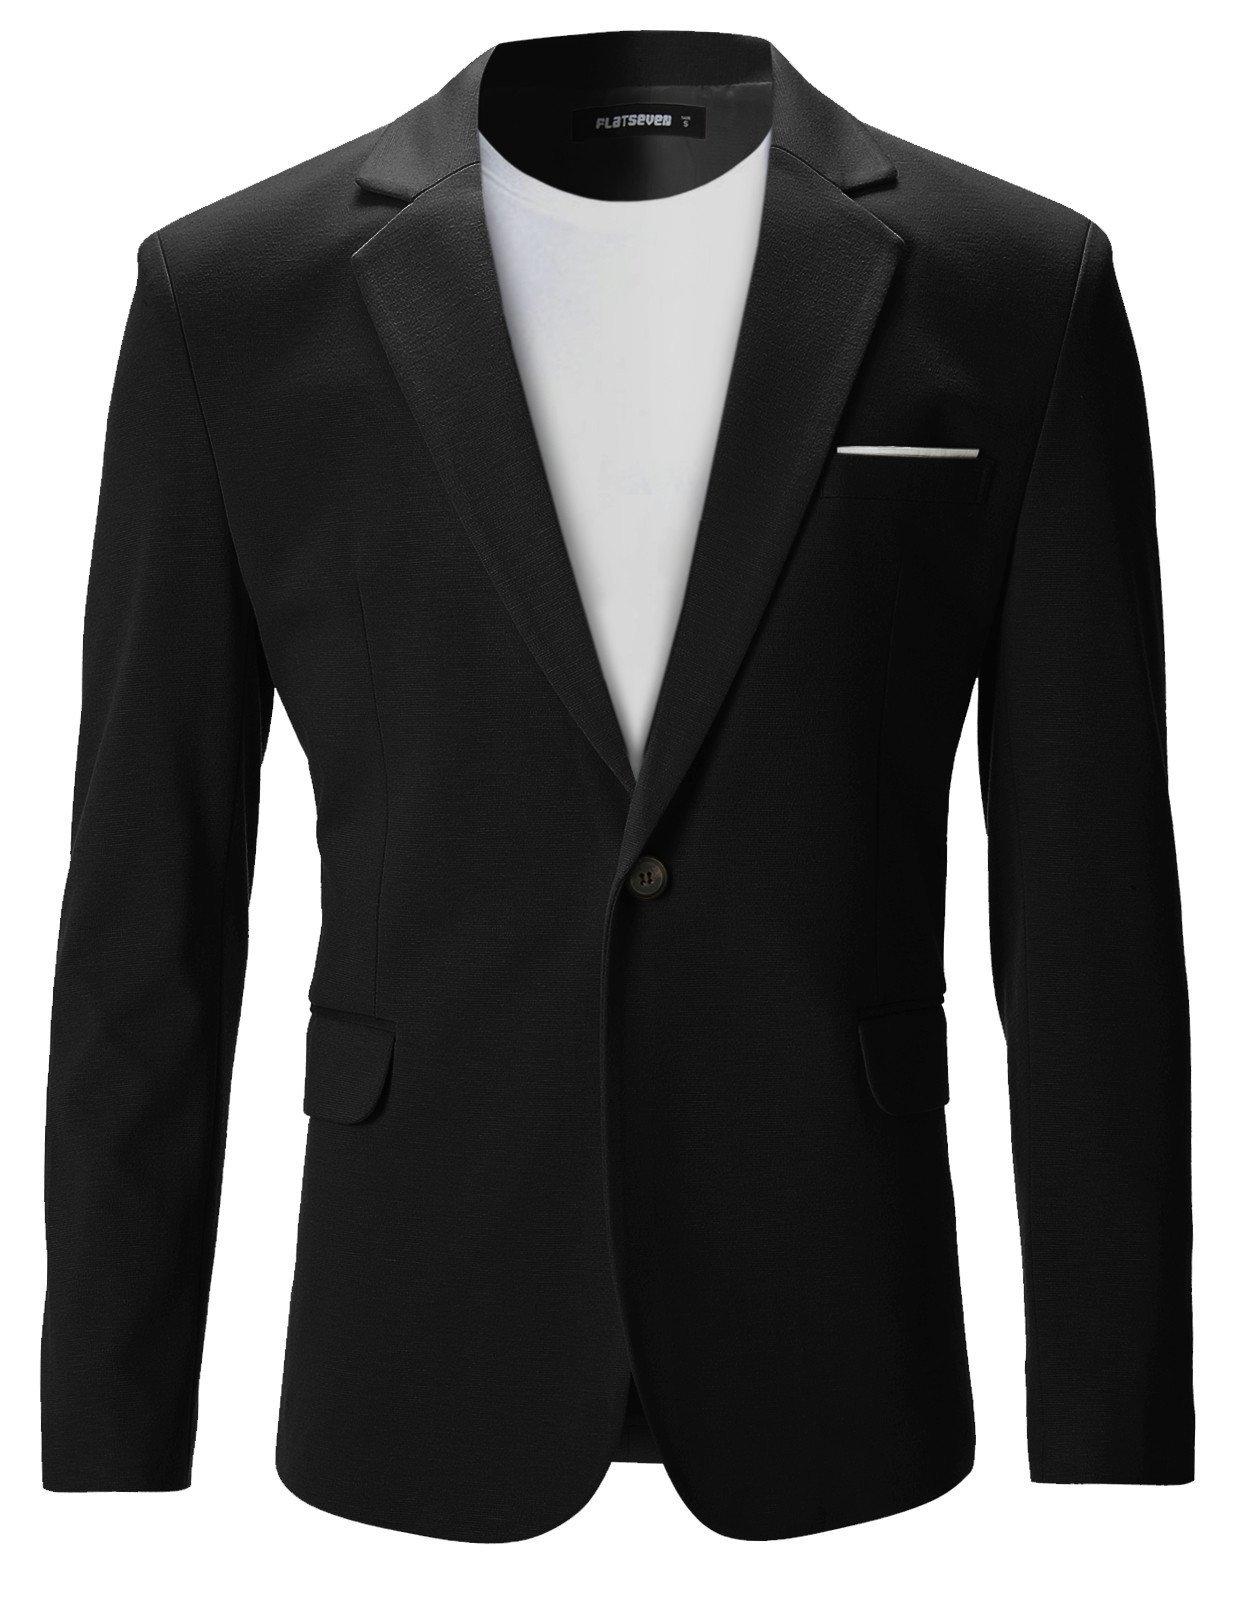 FLATSEVEN Mens Slim Fit Casual Premium Blazer Jacket (BJ102) Black, S